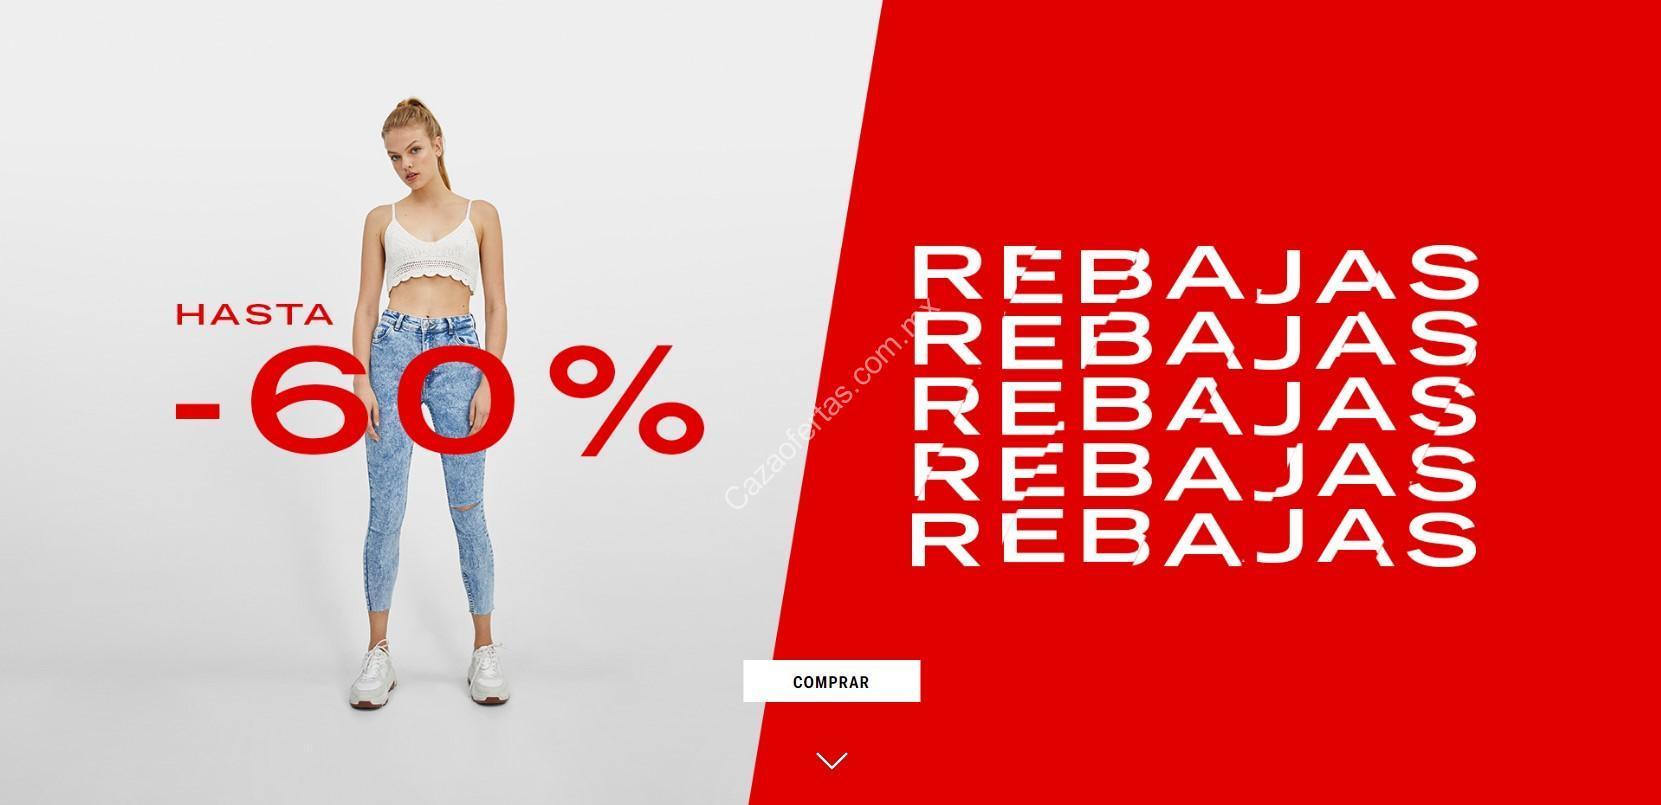 f6cc0e2d8 Segundas Rebajas Bershka verano 2019: Hasta 60% de descuento